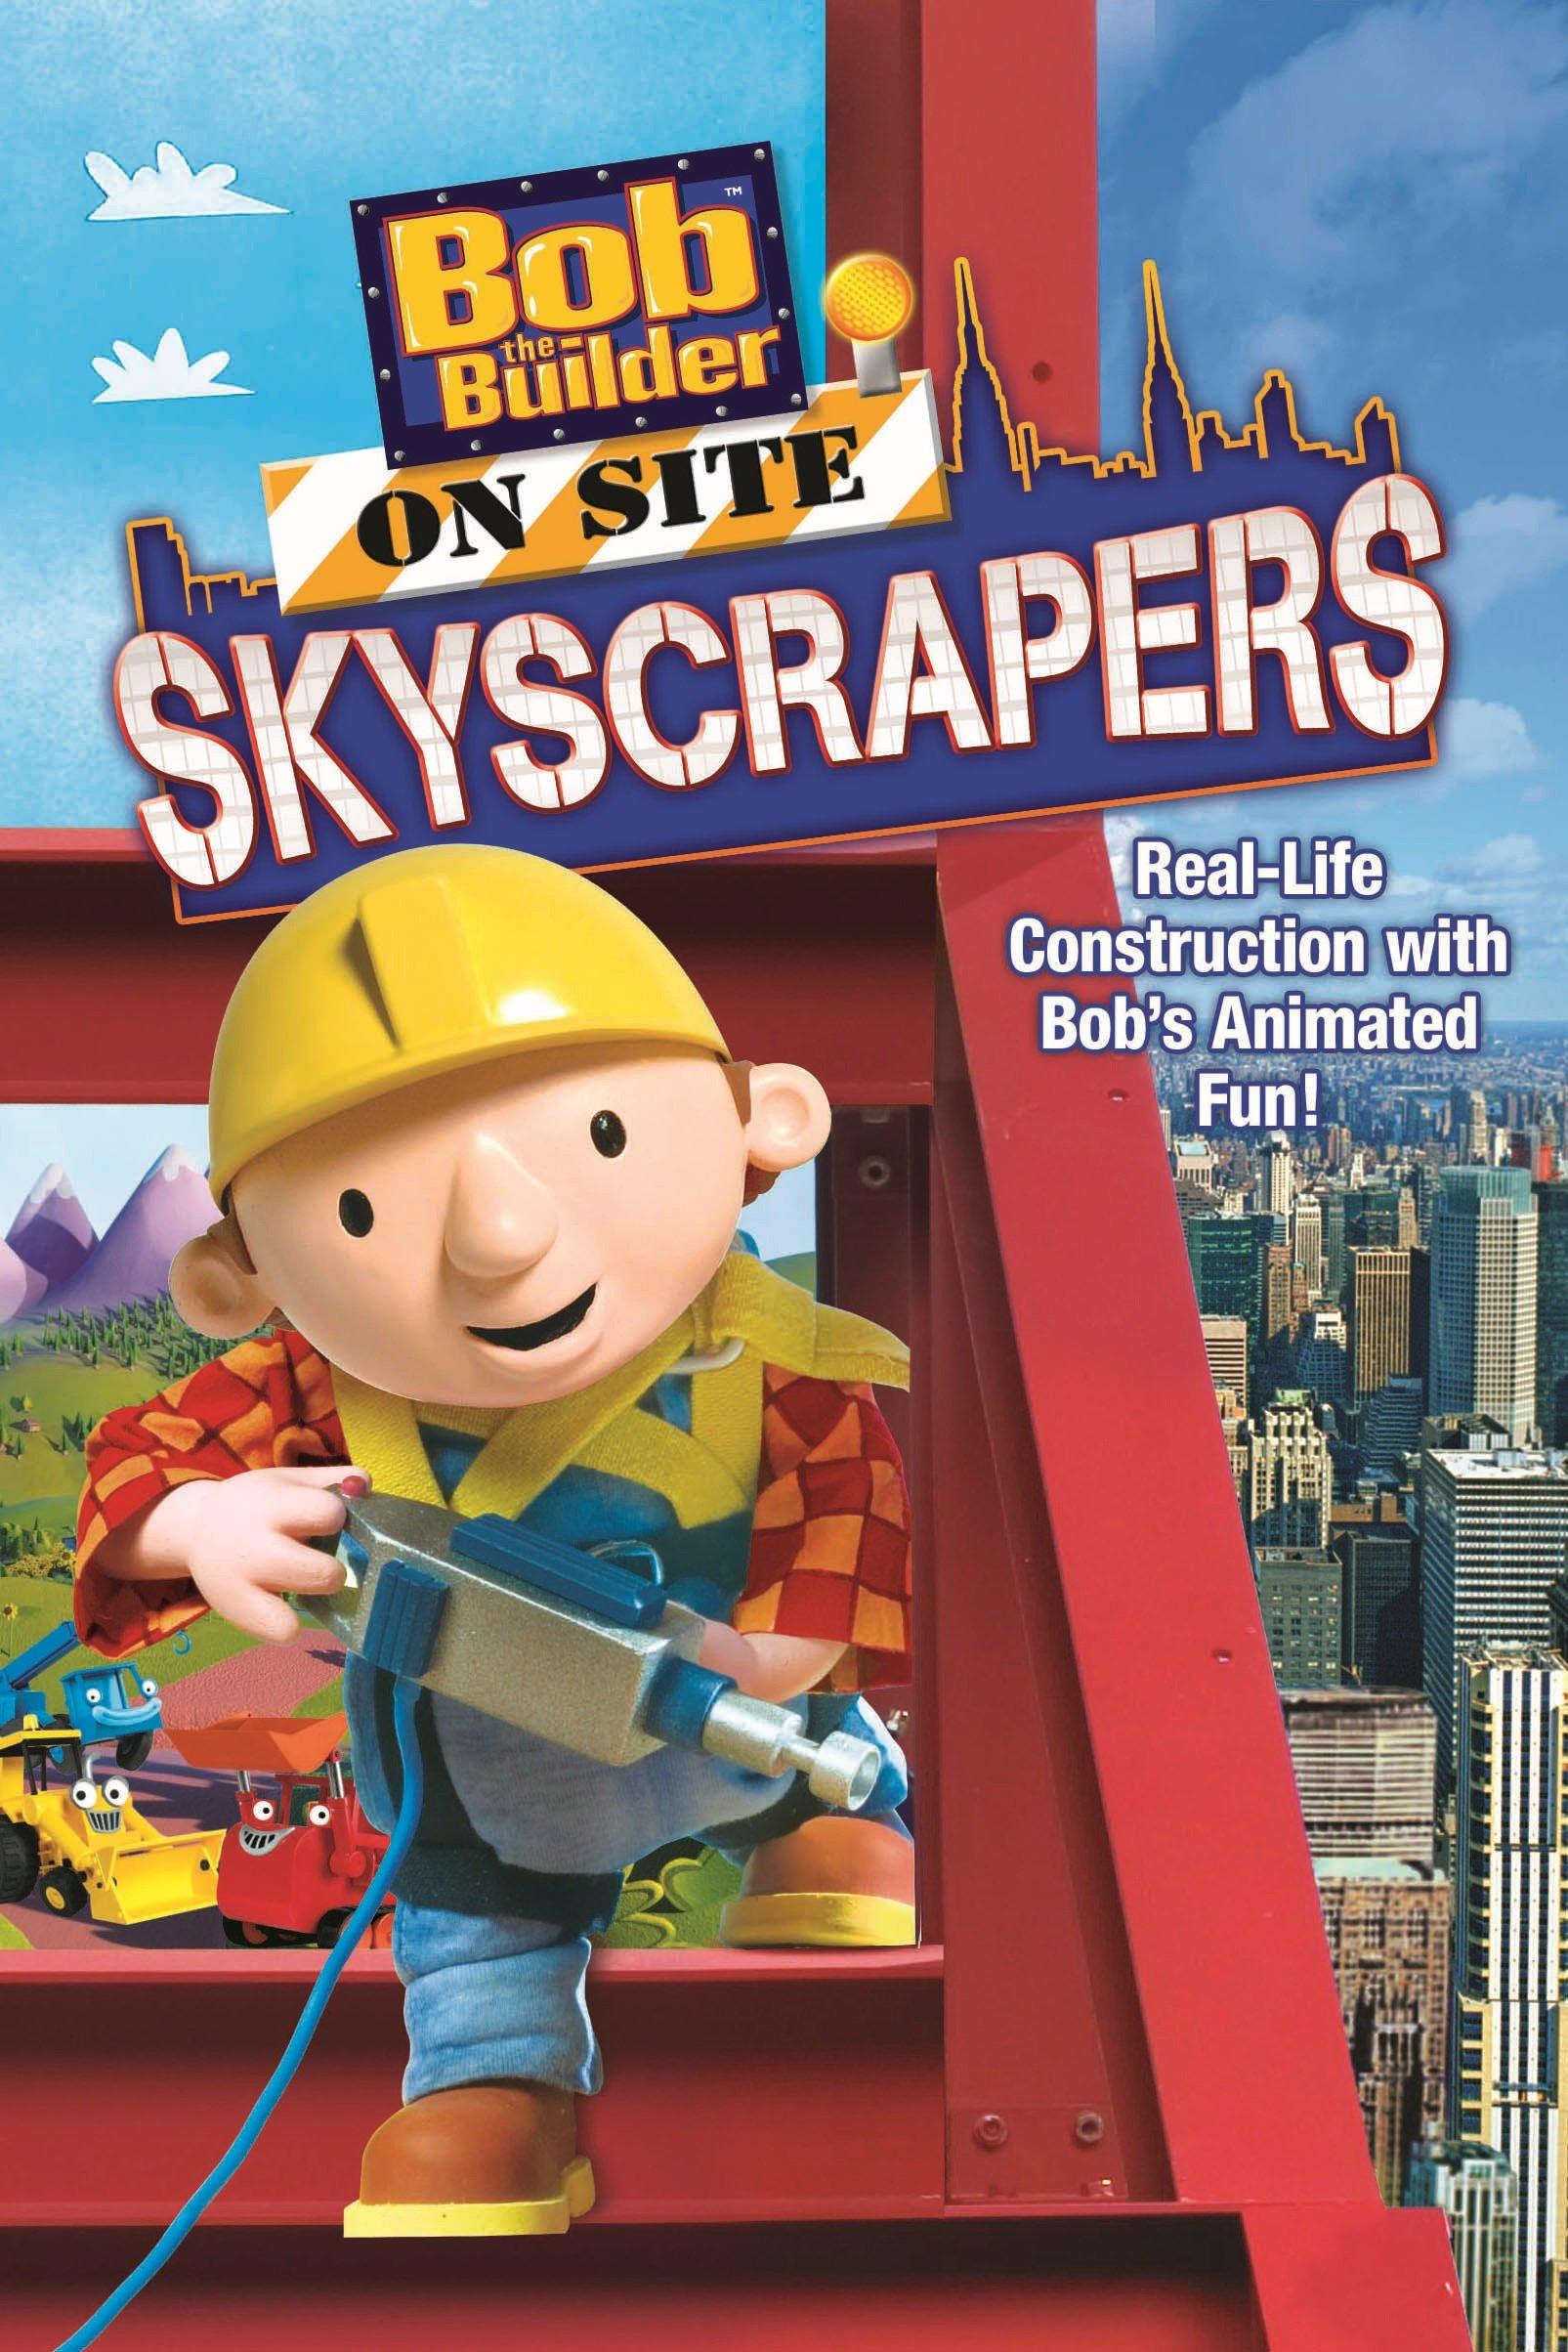 Bob the builder live online dvd rental - Amazon Com Bob The Builder On Site Skyscrapers Brian Little Simon Nicholson Amazon Digital Services Llc